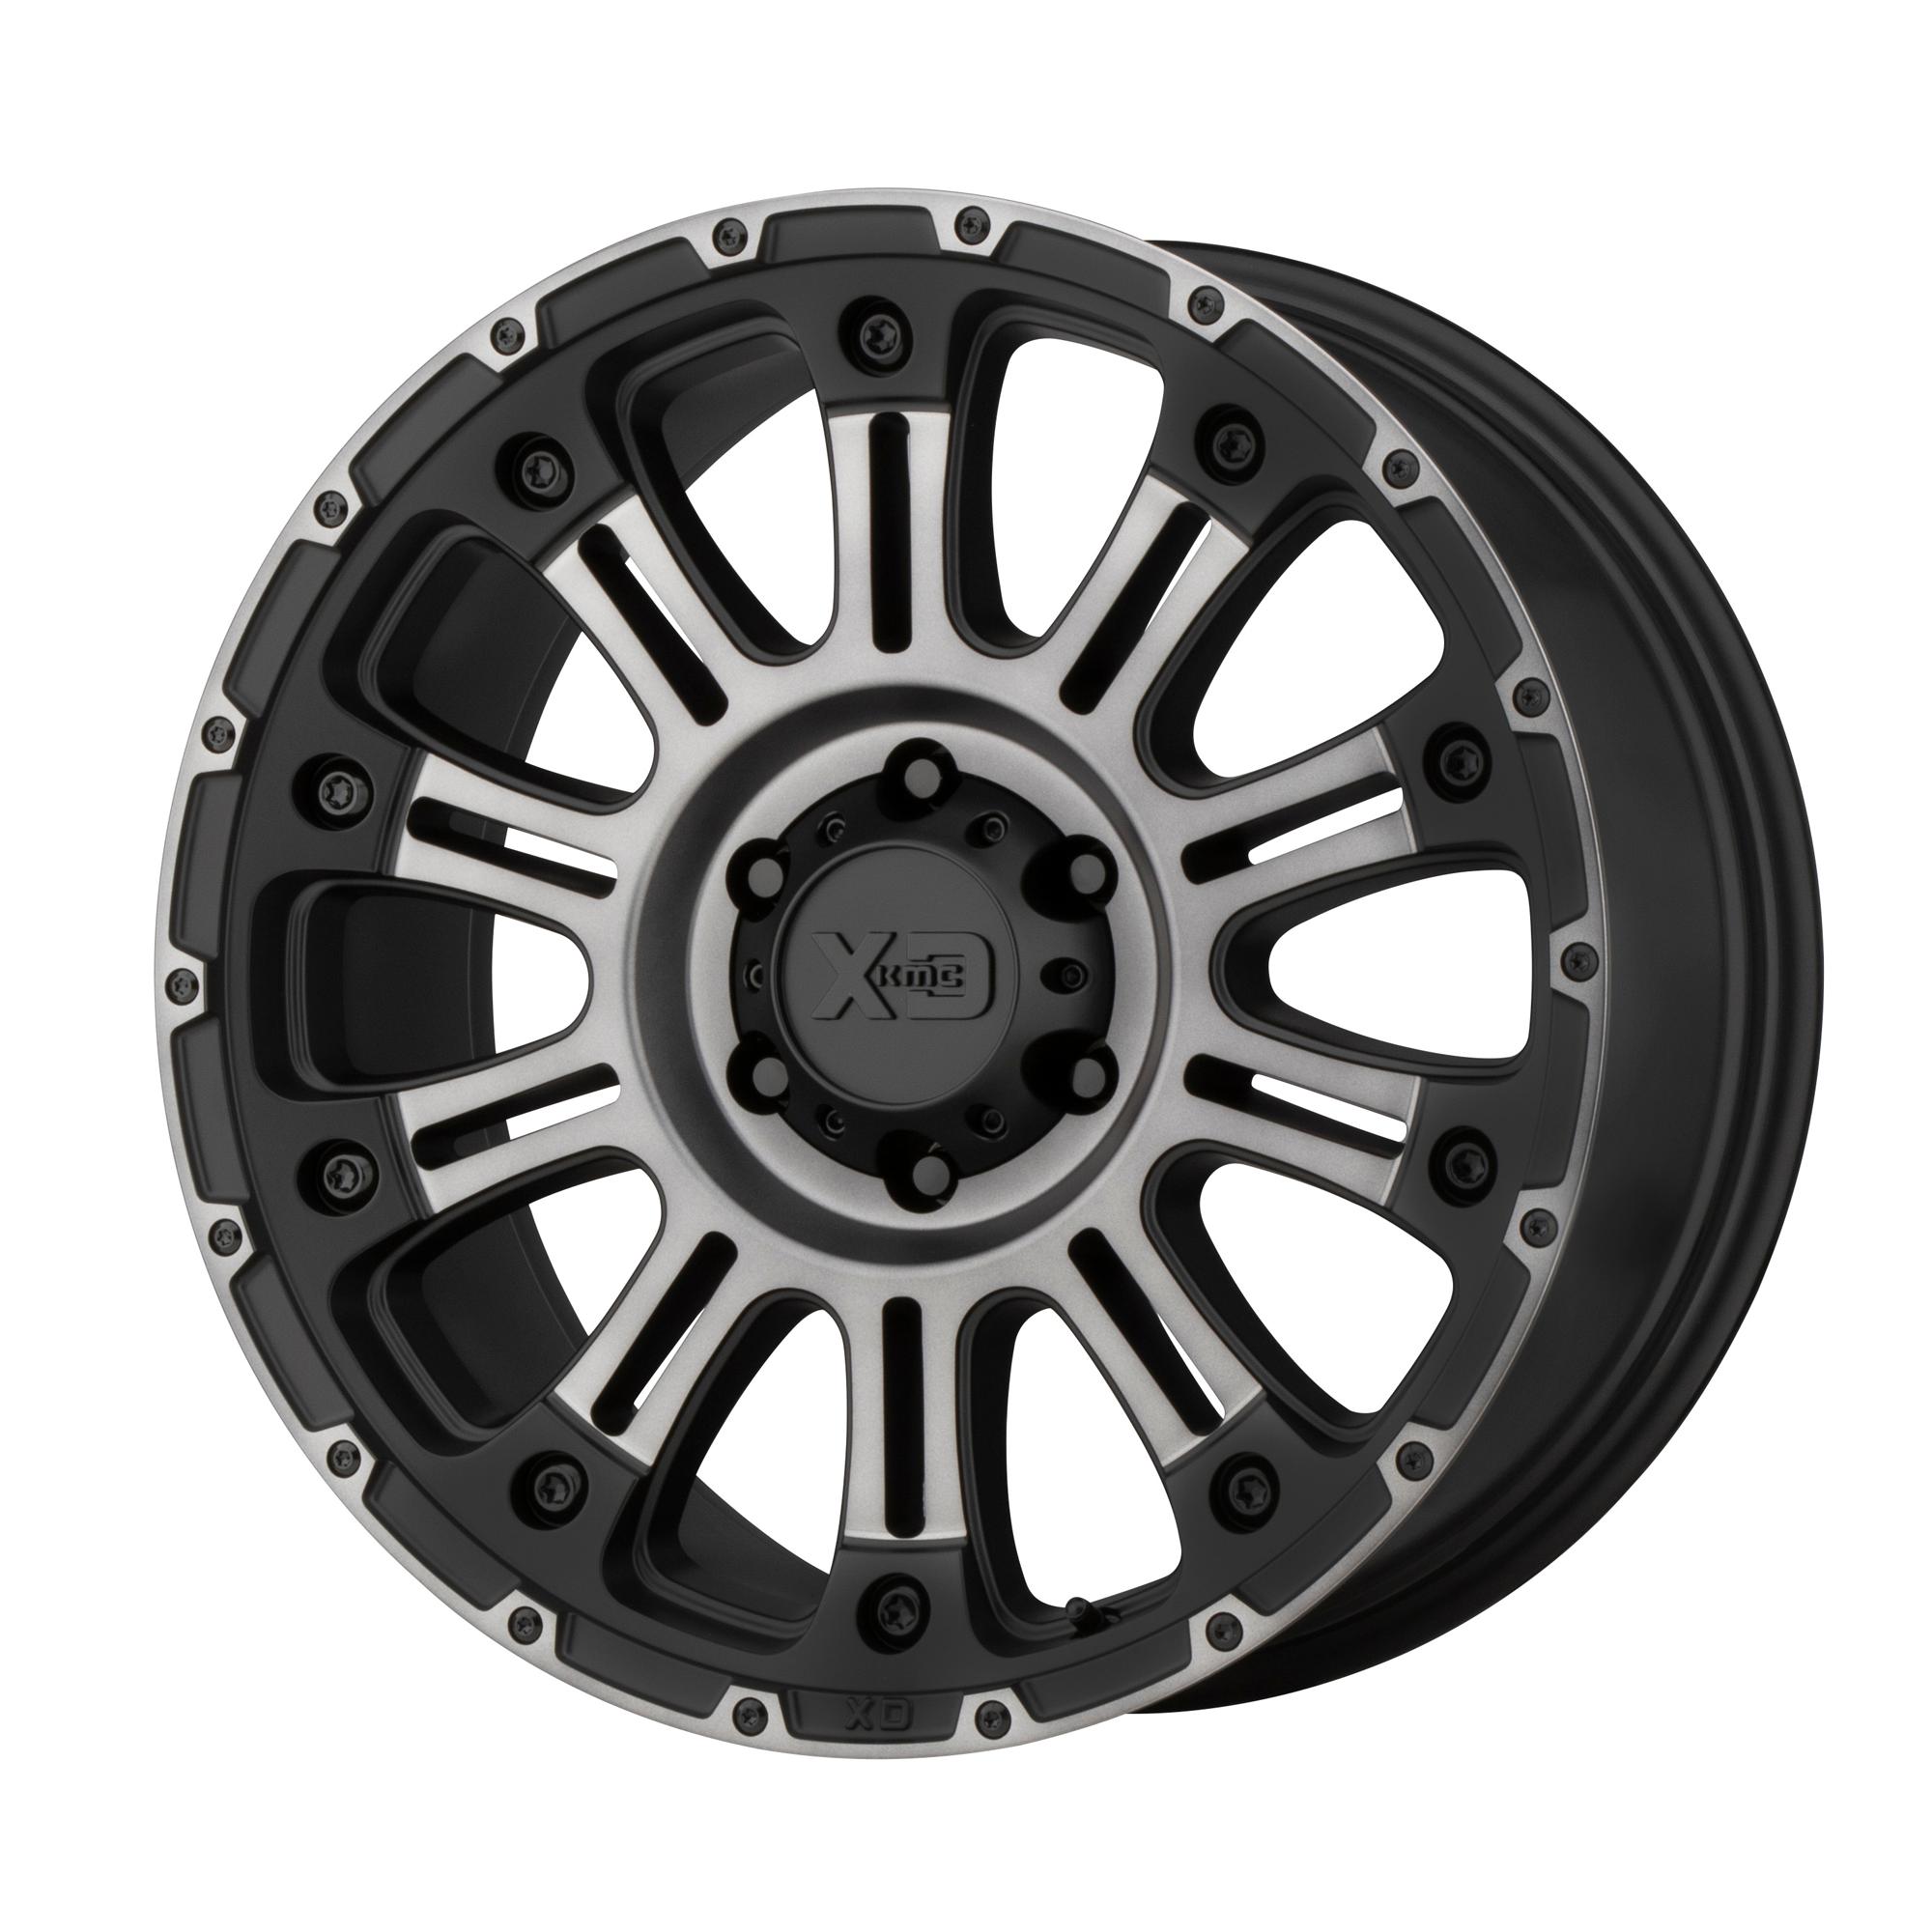 XD SERIES XD829 HOSS II hliníkové disky 9x17 6x139,7 ET18 Satin Black Machined Gray Tint